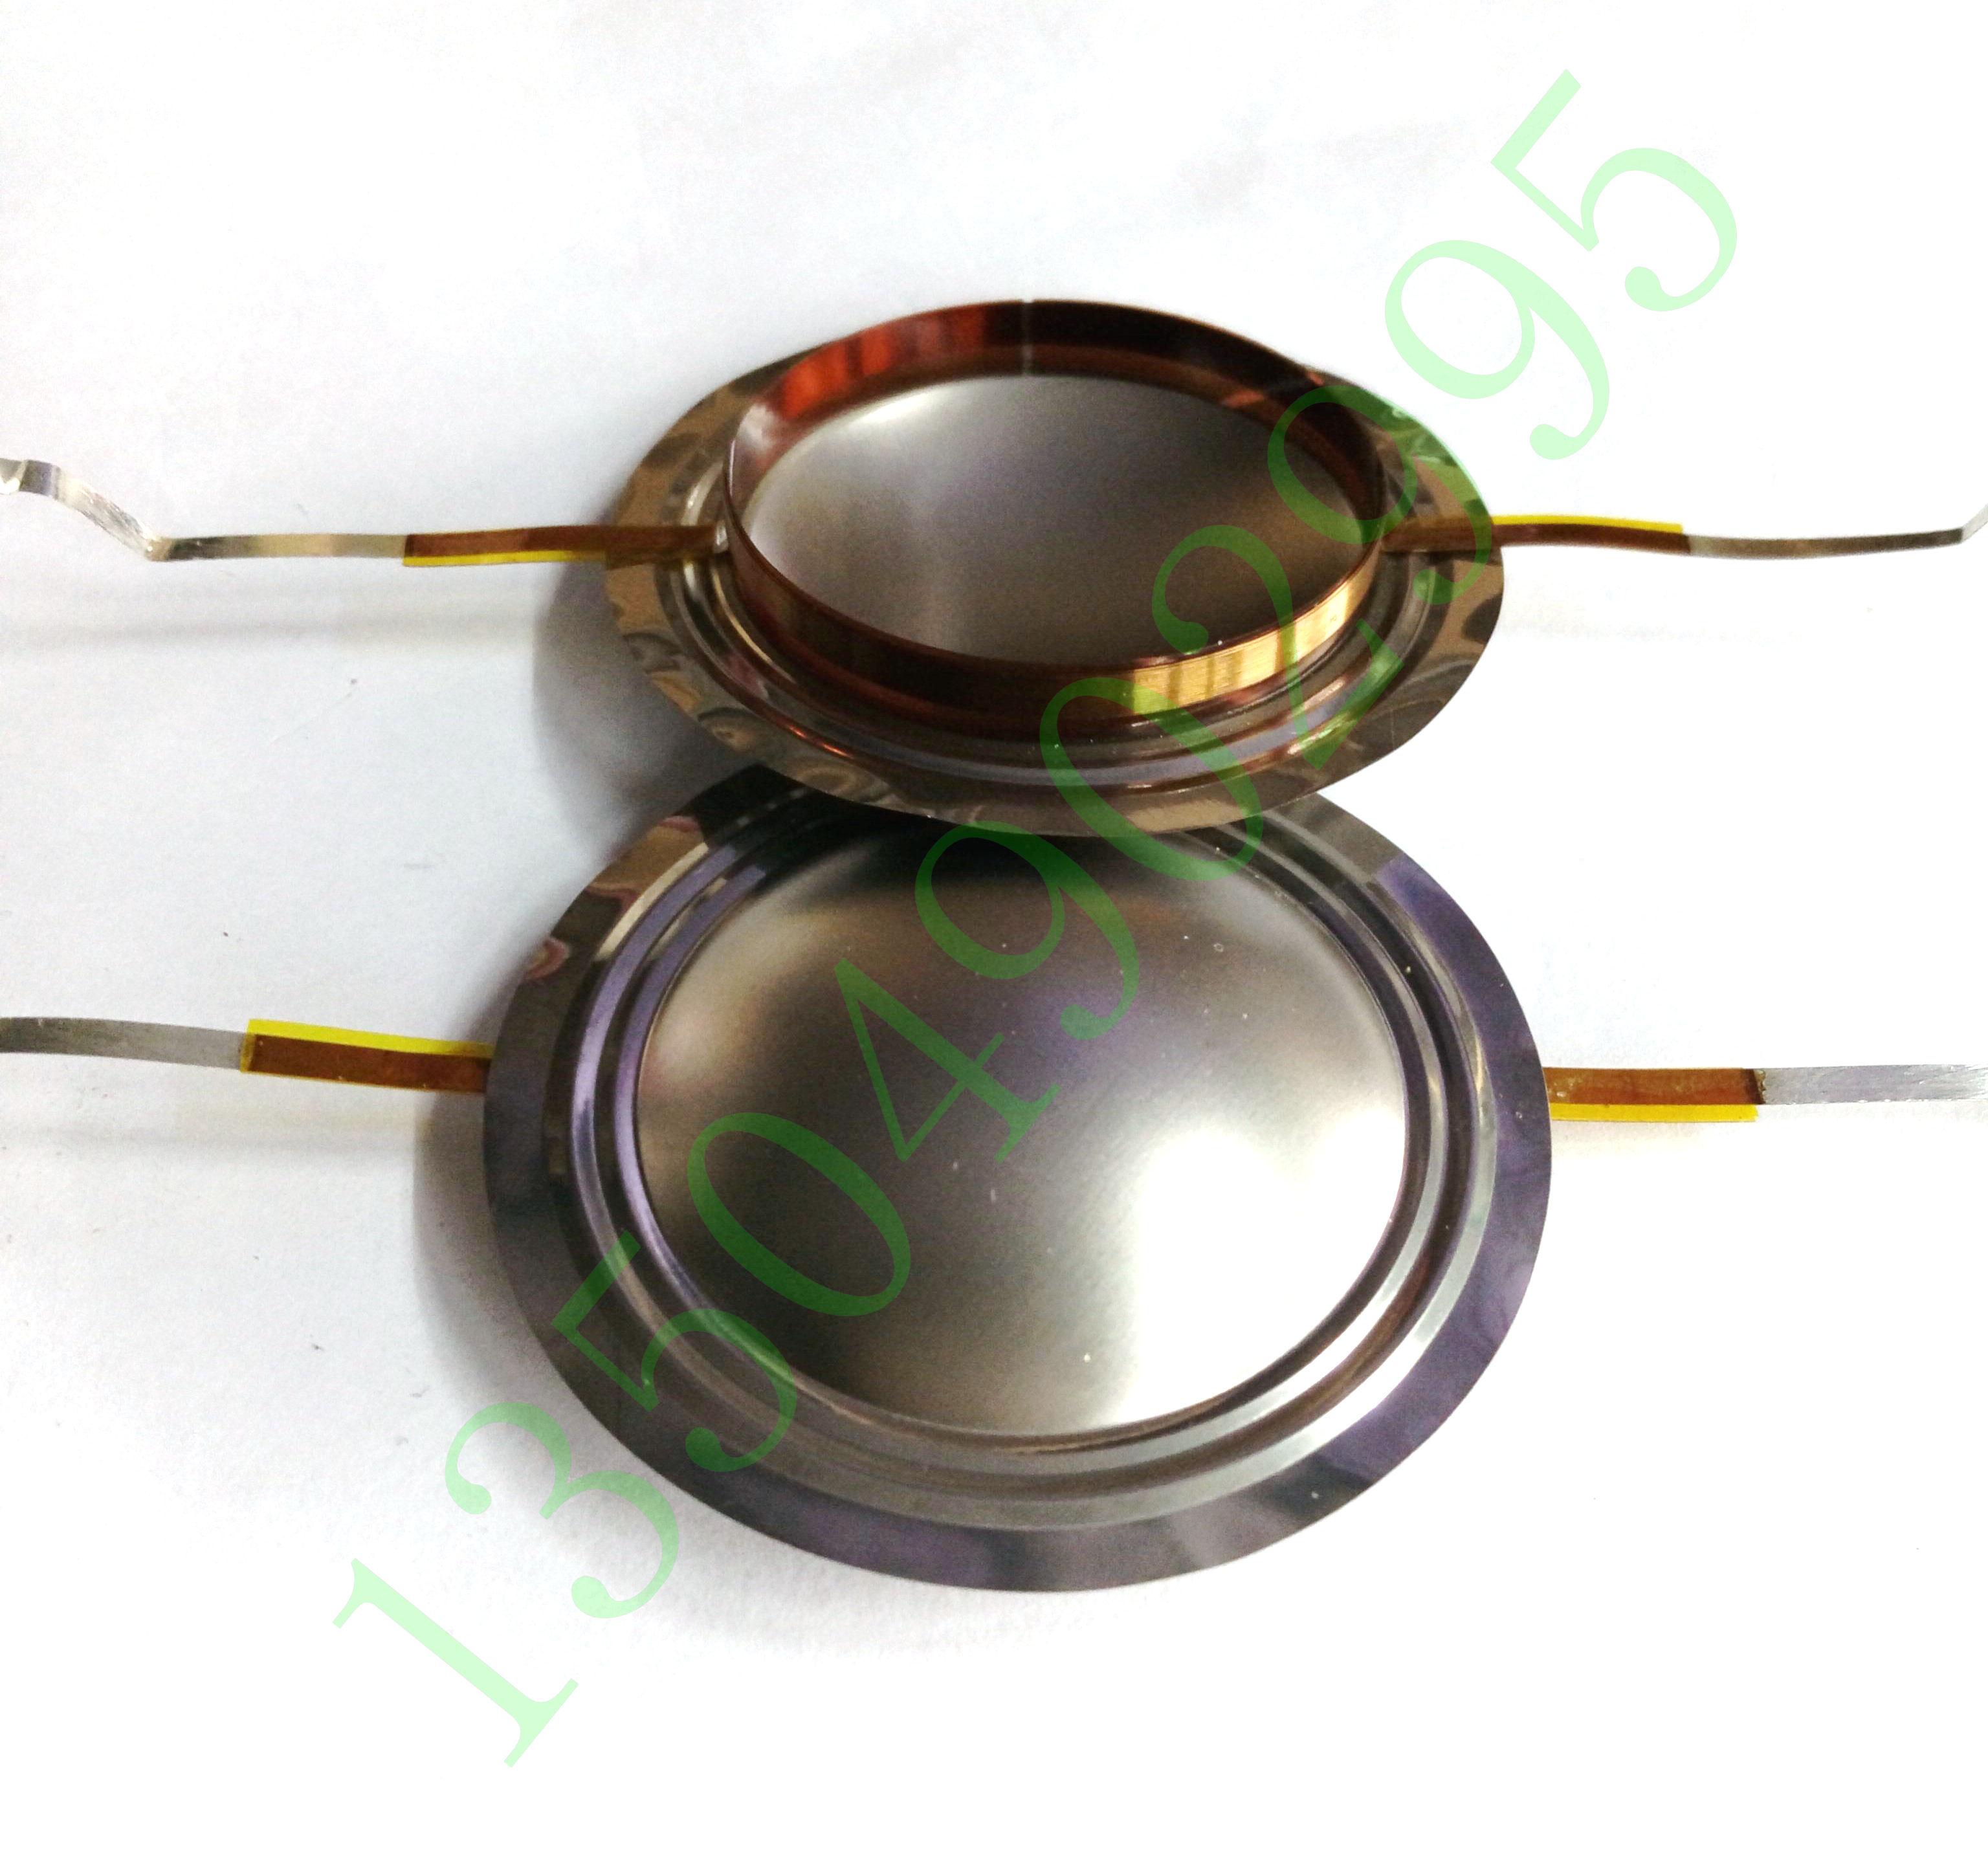 35,5 мм твитер титана Титан Титан круглые провода катушки 35.5 ВЧ ВЧ фильм